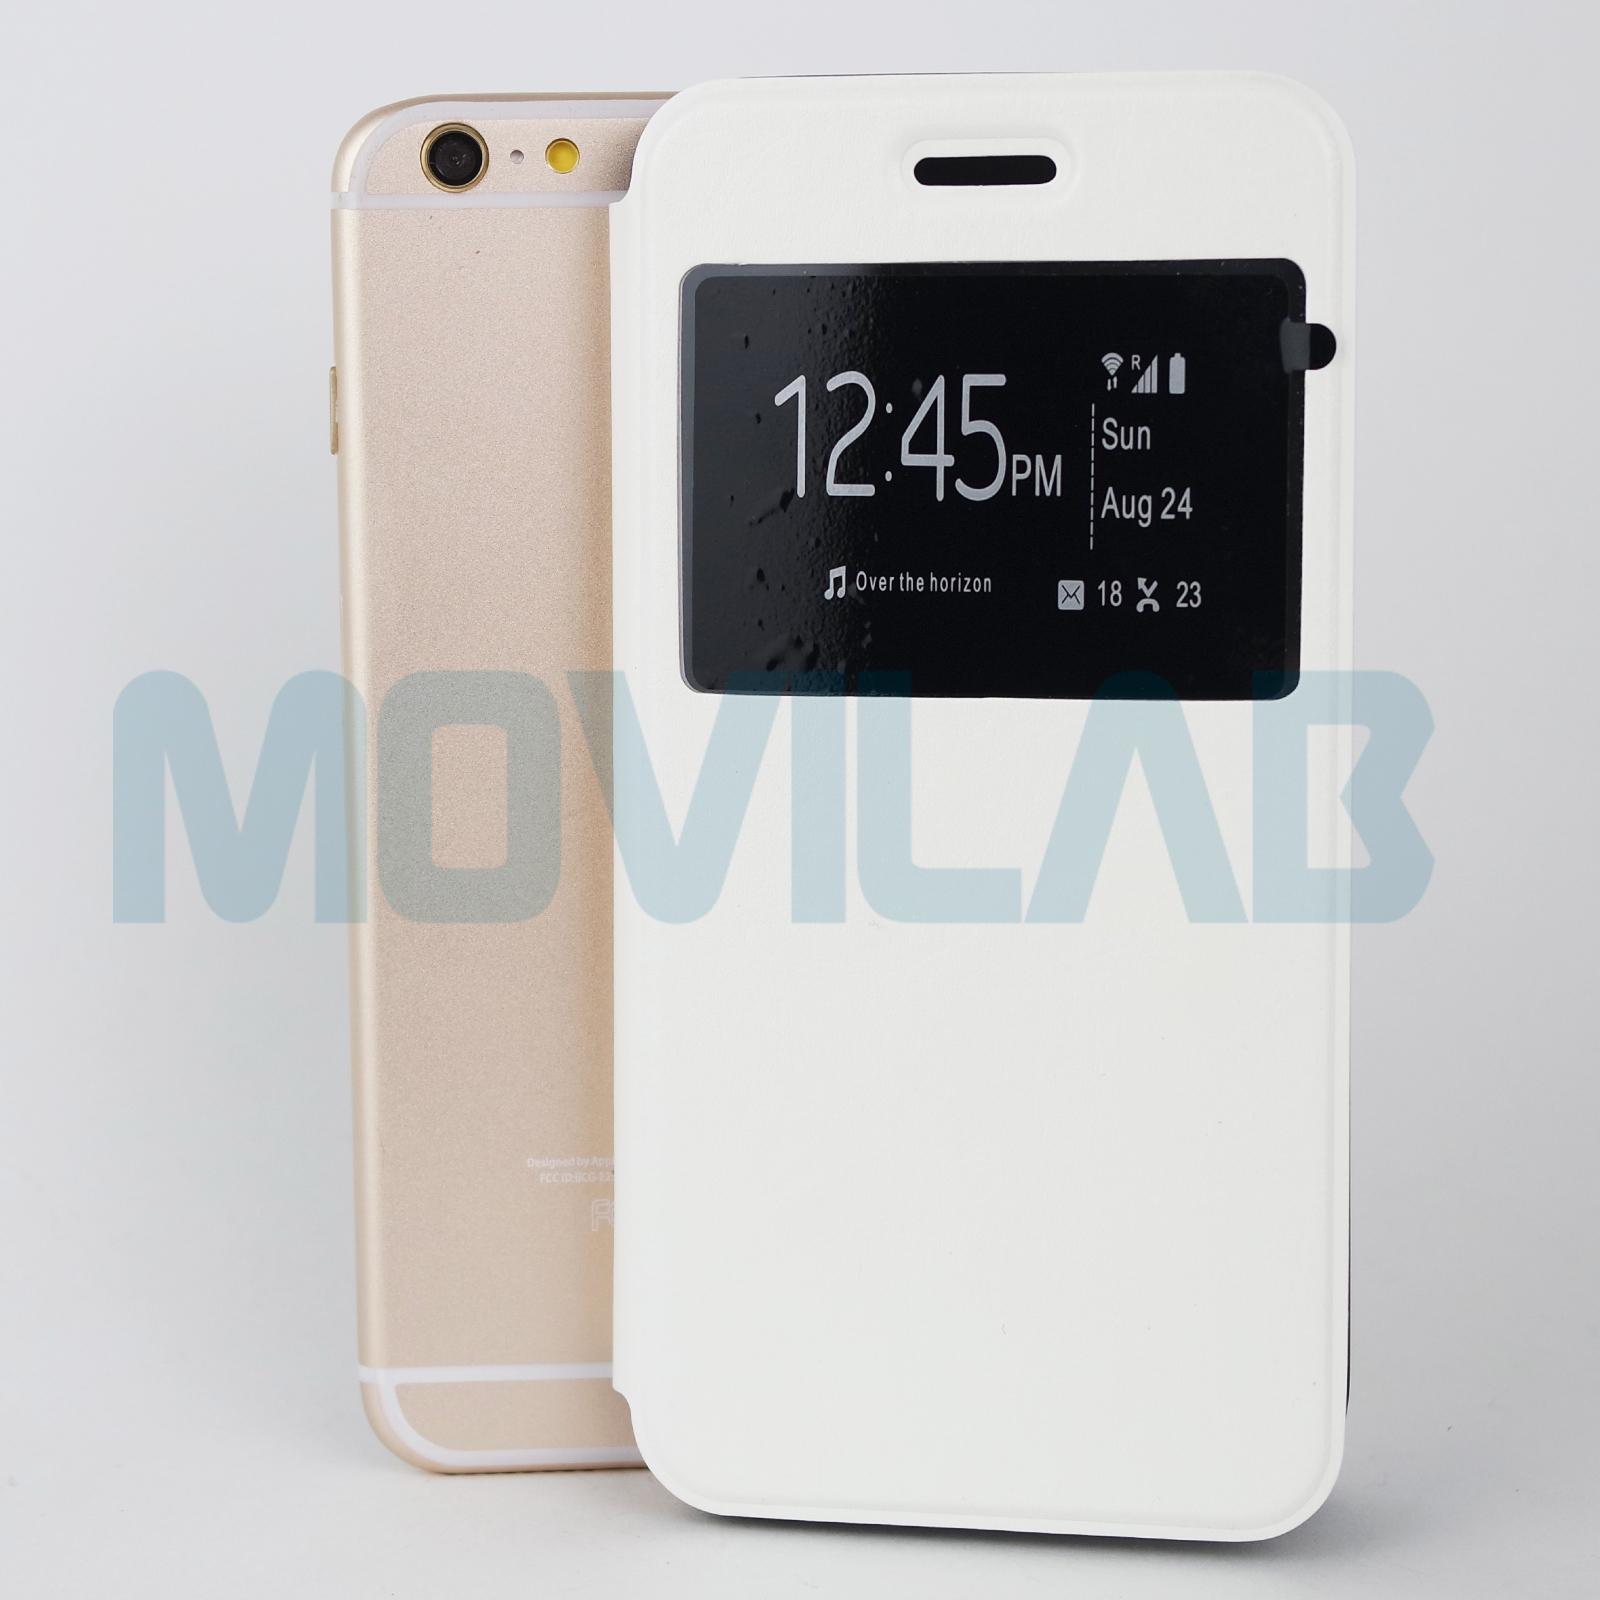 FundaIphone 6 Plus blanca